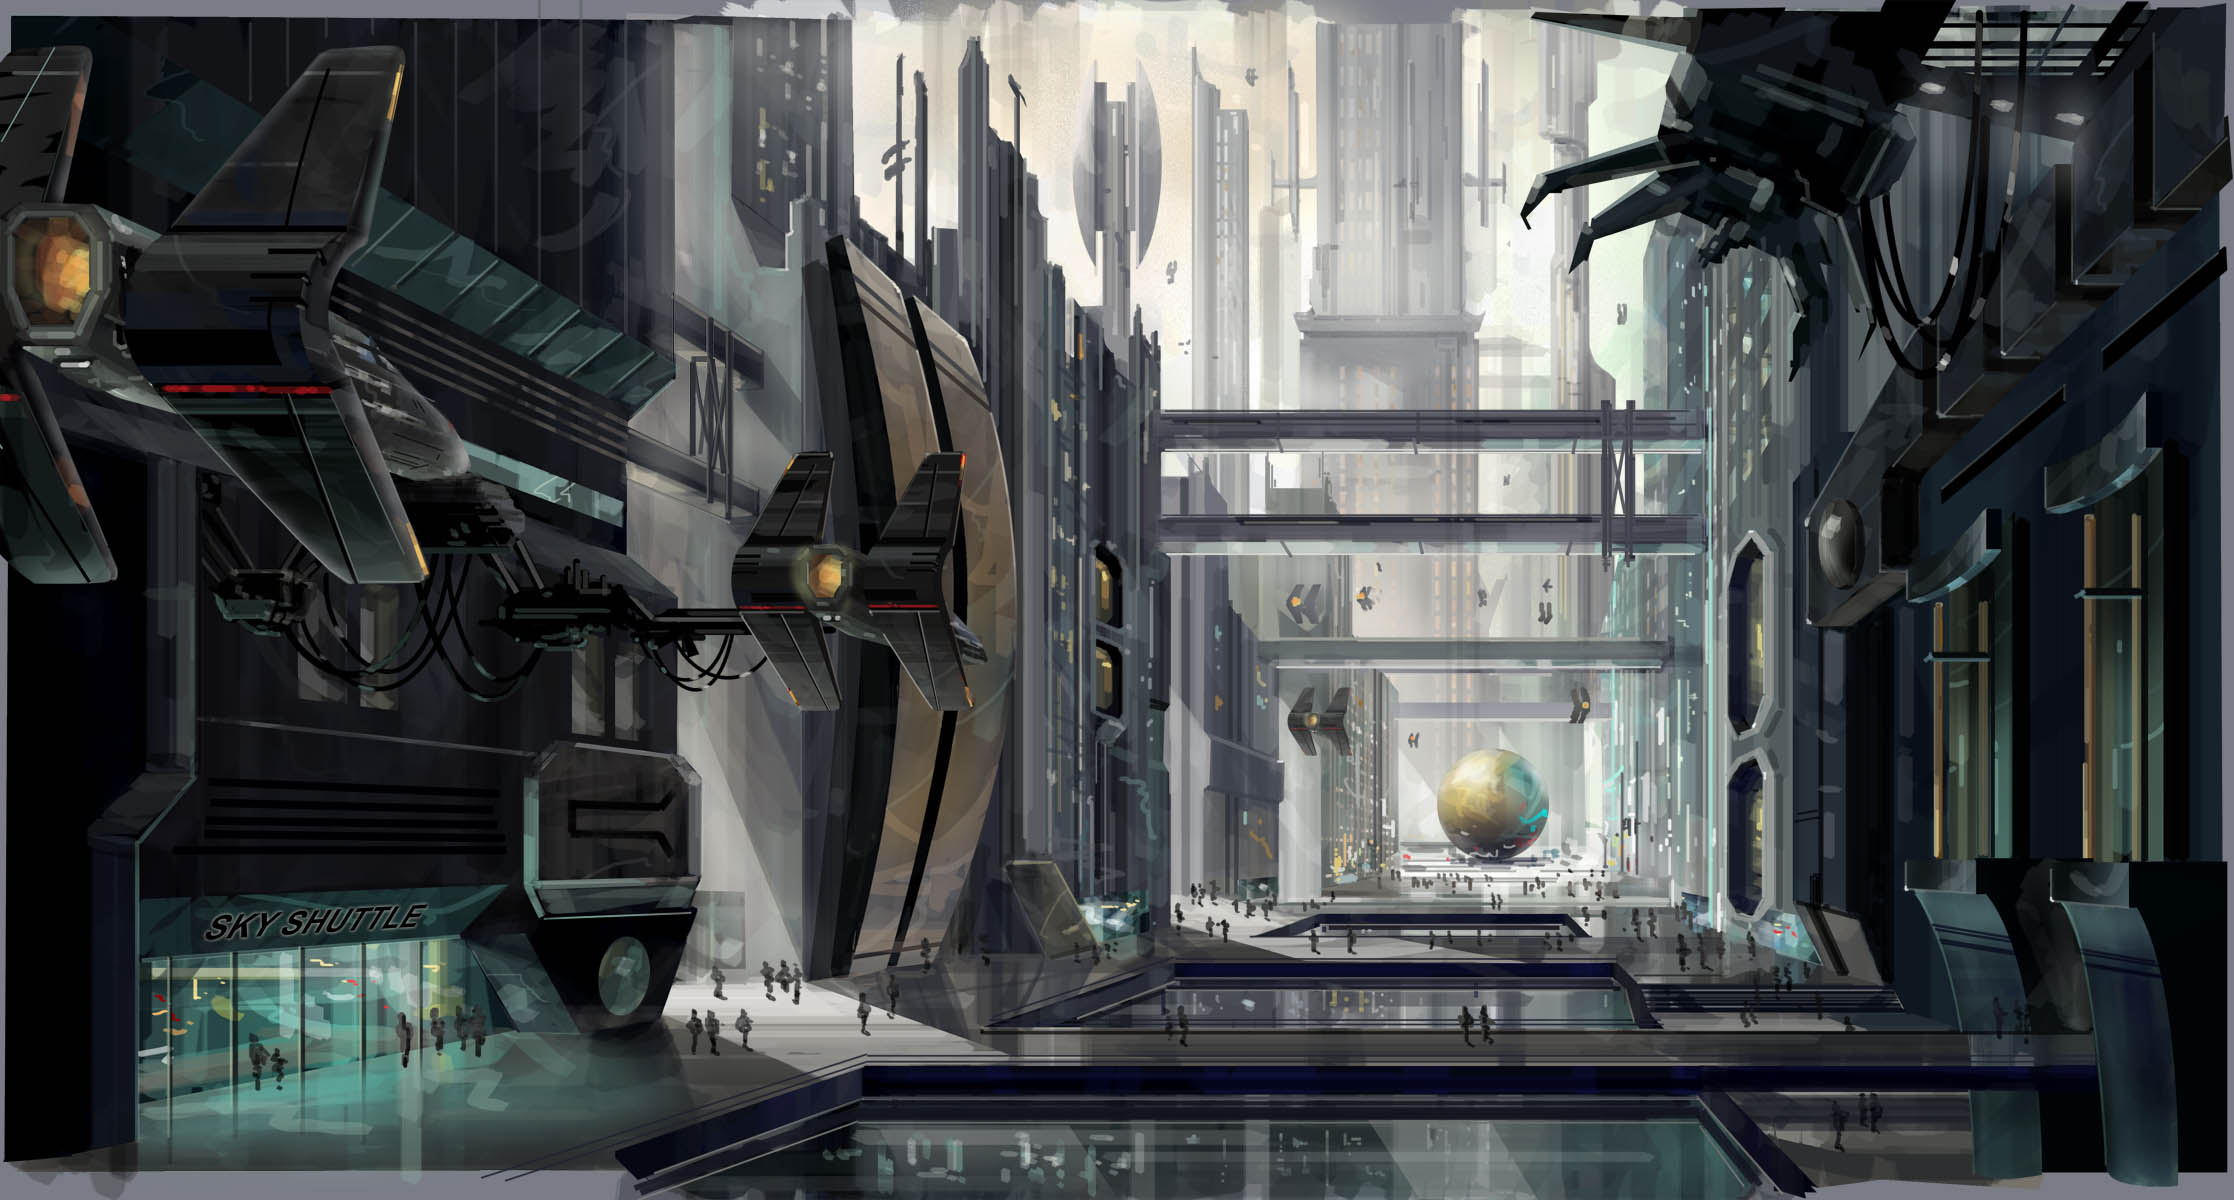 Conceptual illustration Future City, Hollywood, CA